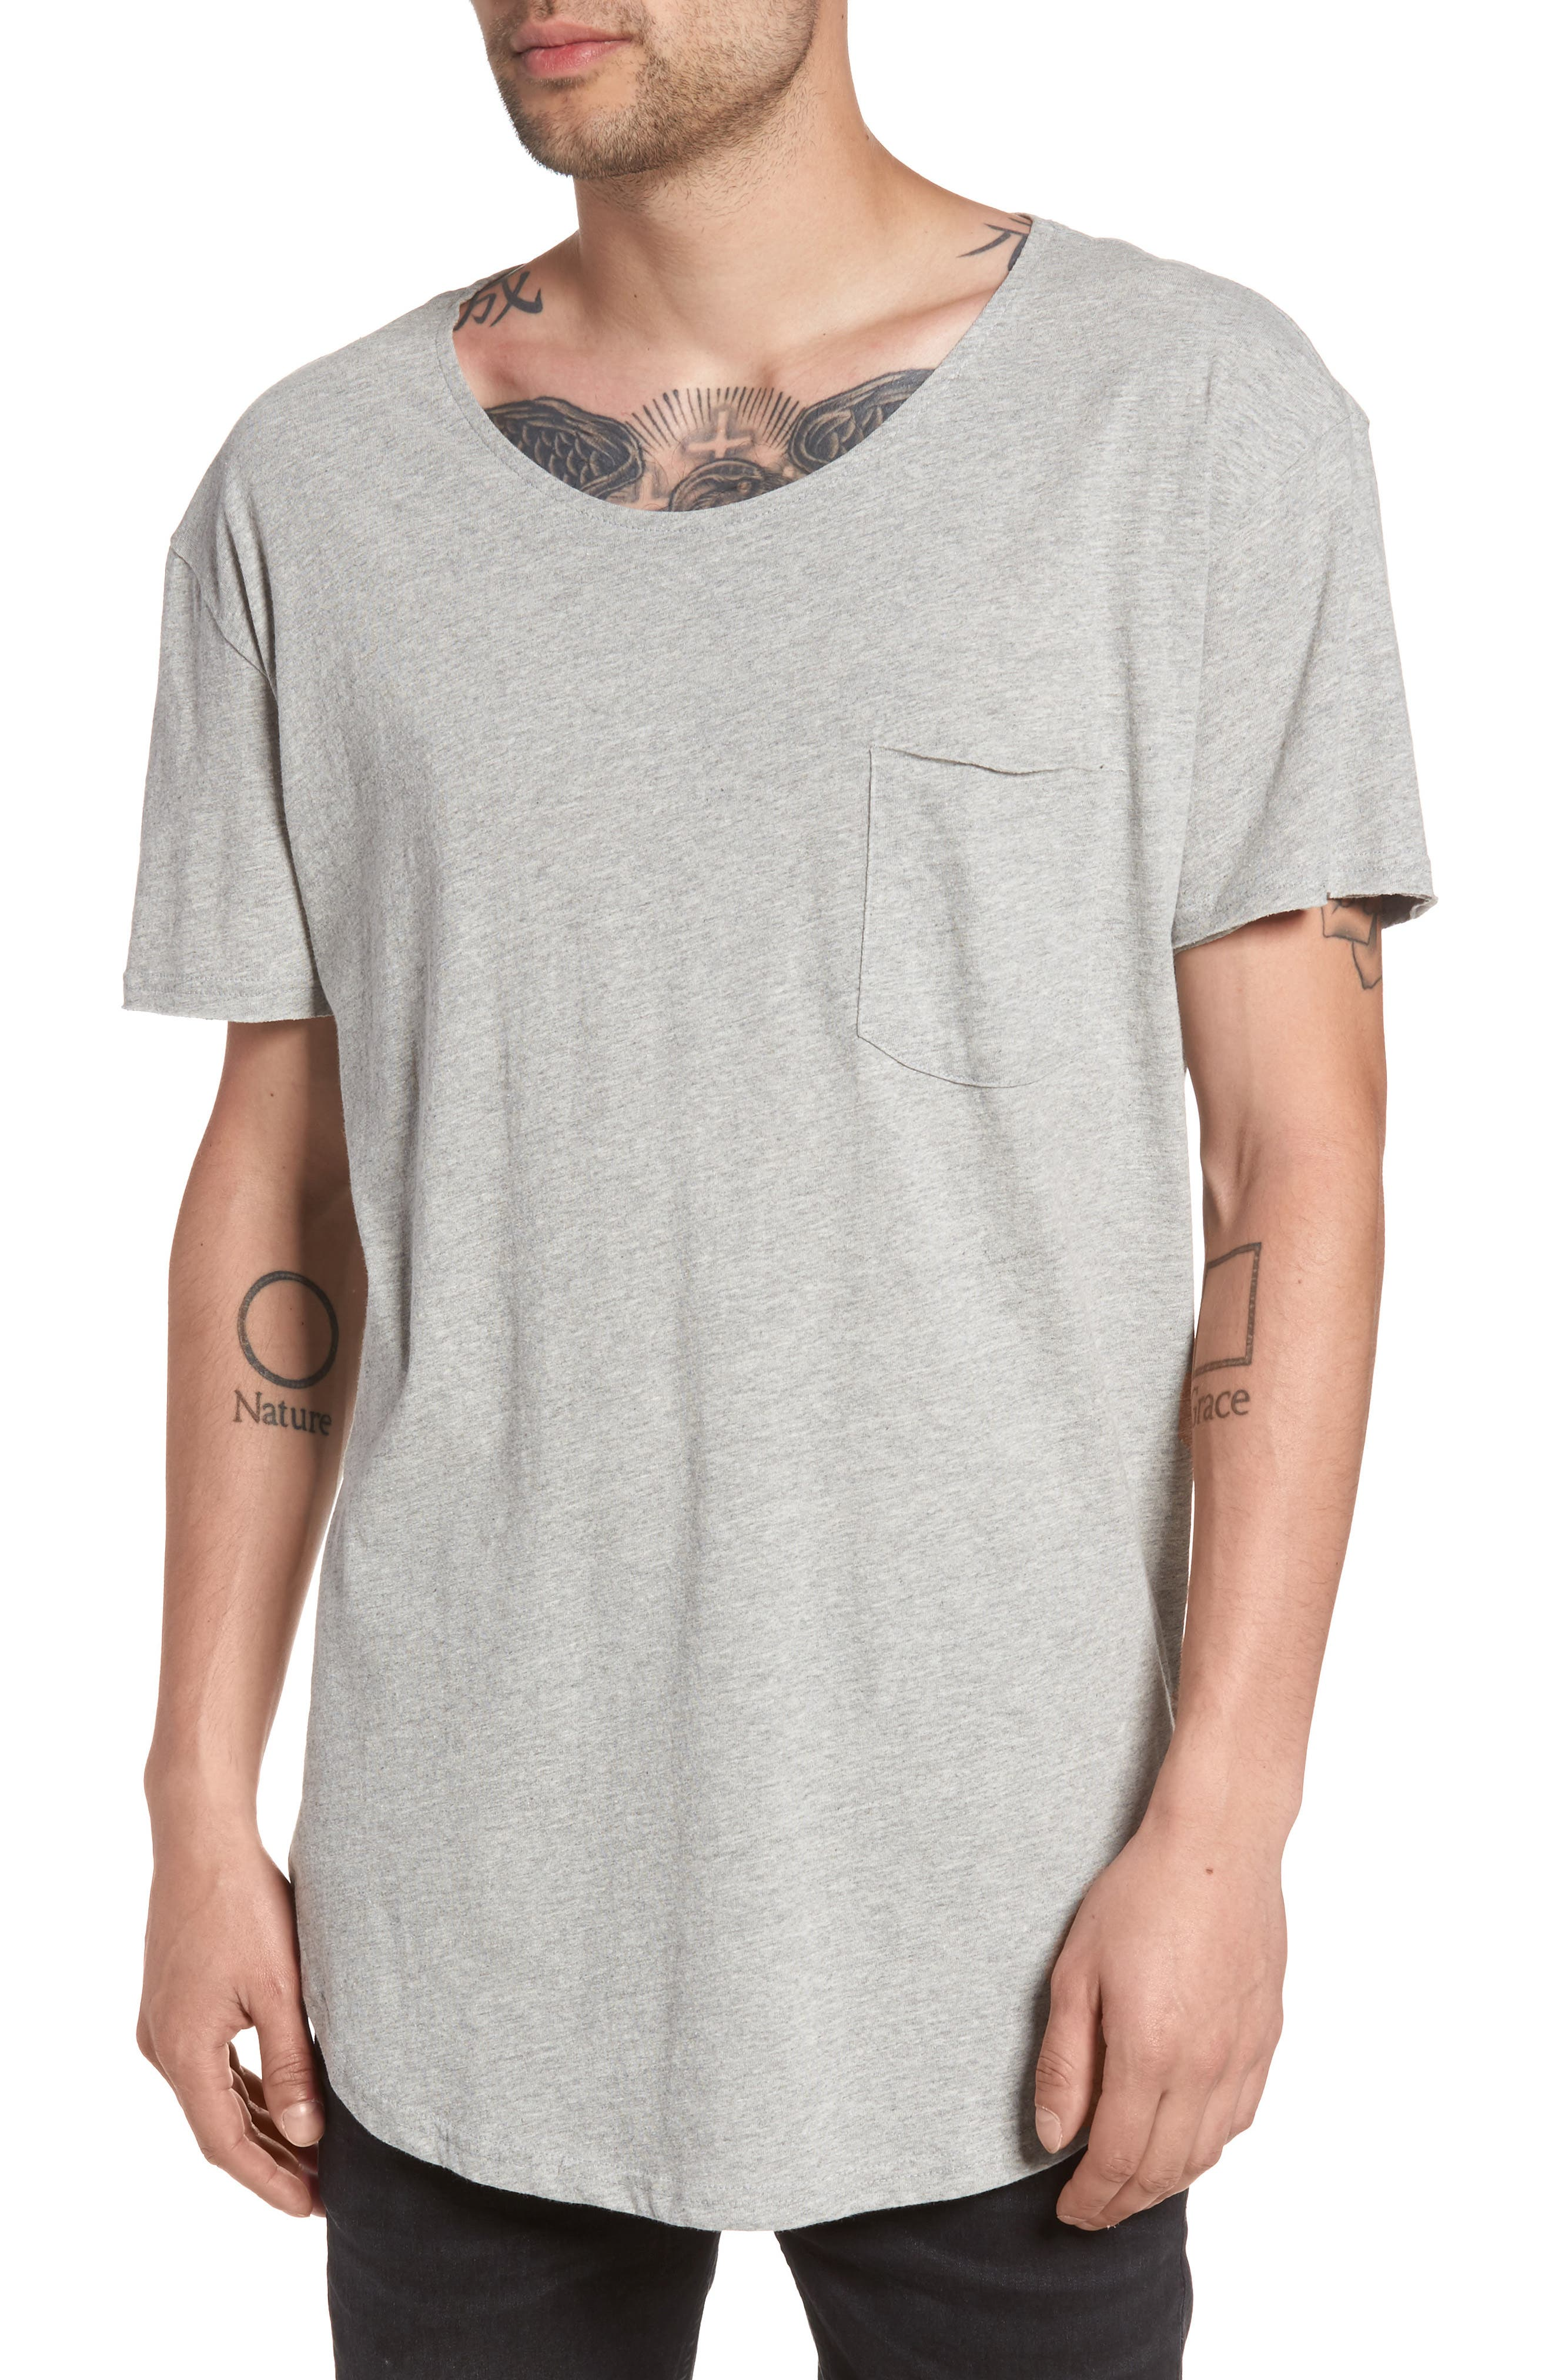 The Rail Longline Scoop Neck T-Shirt